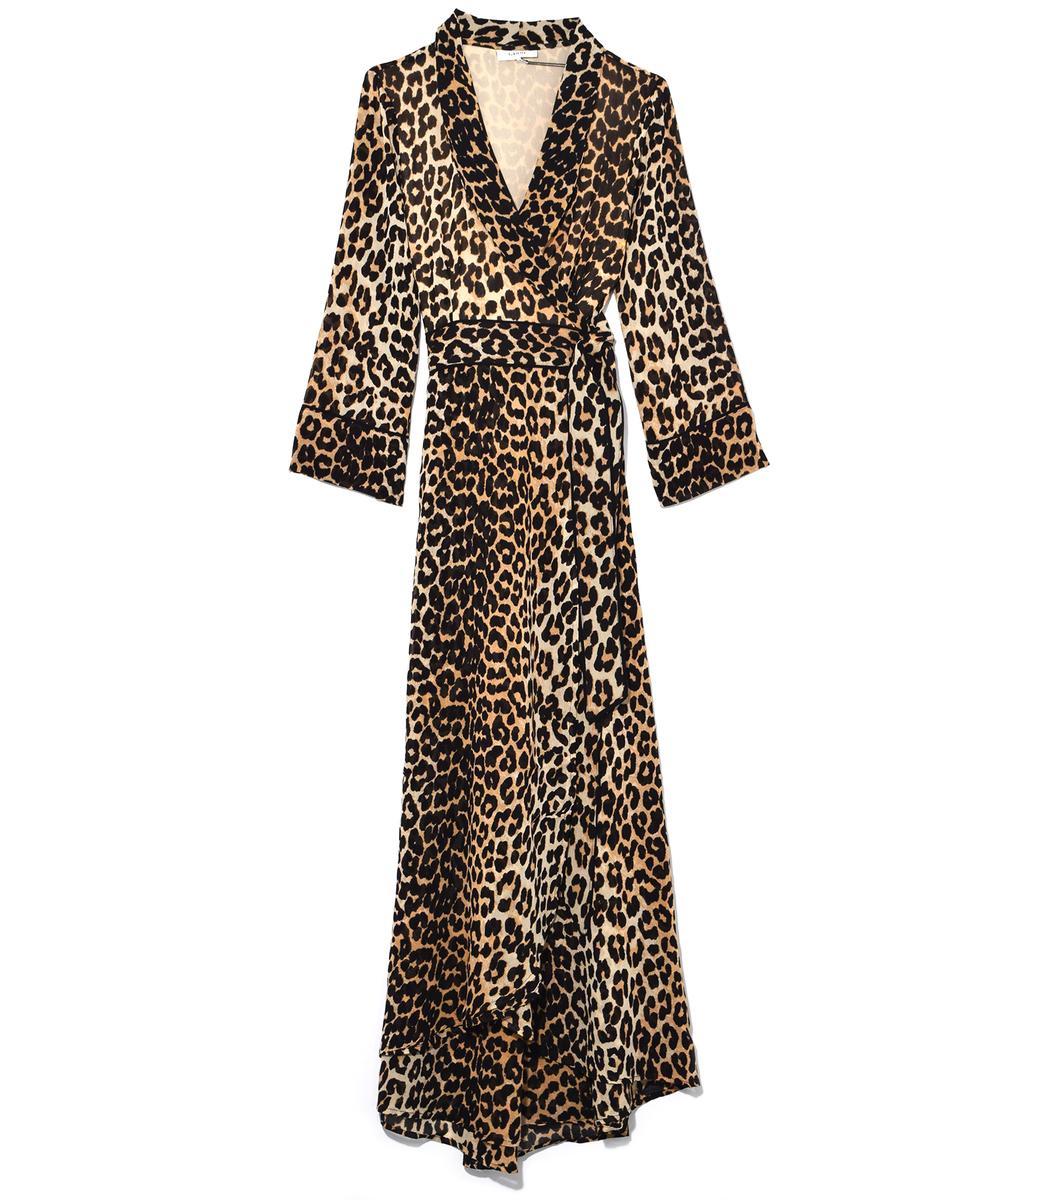 Ganni Fairfax Georgette Wrap Dress In Leopard In Print